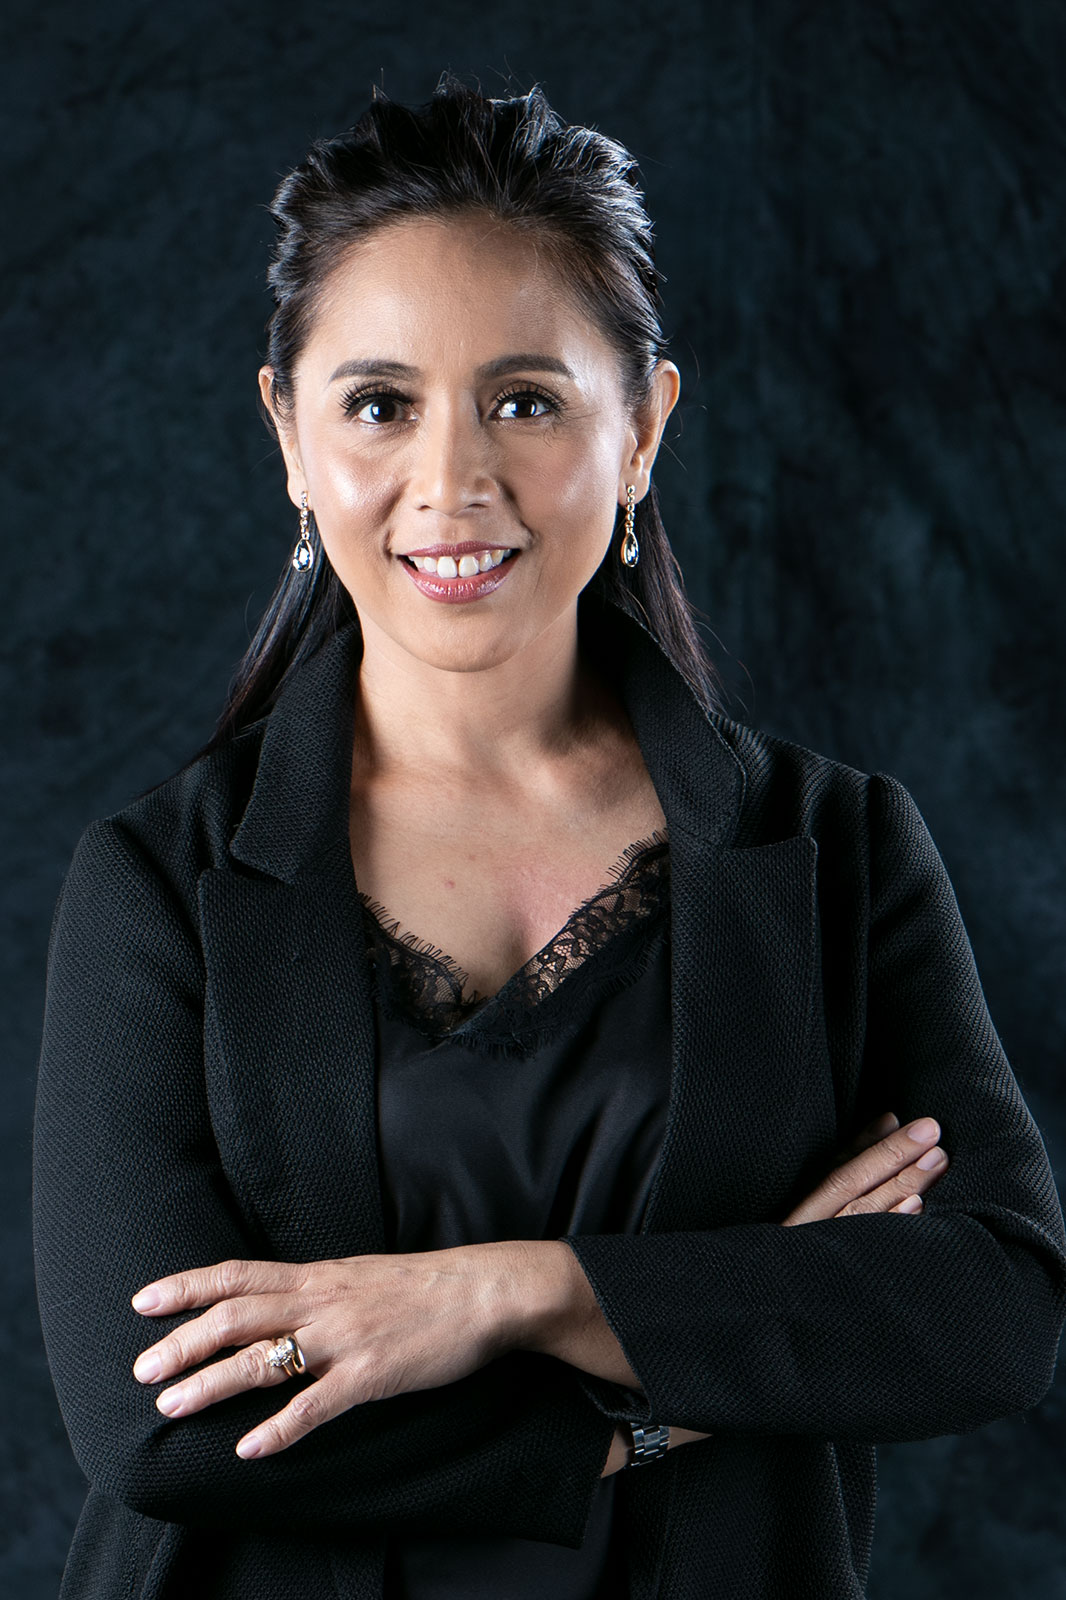 Pia Domingo